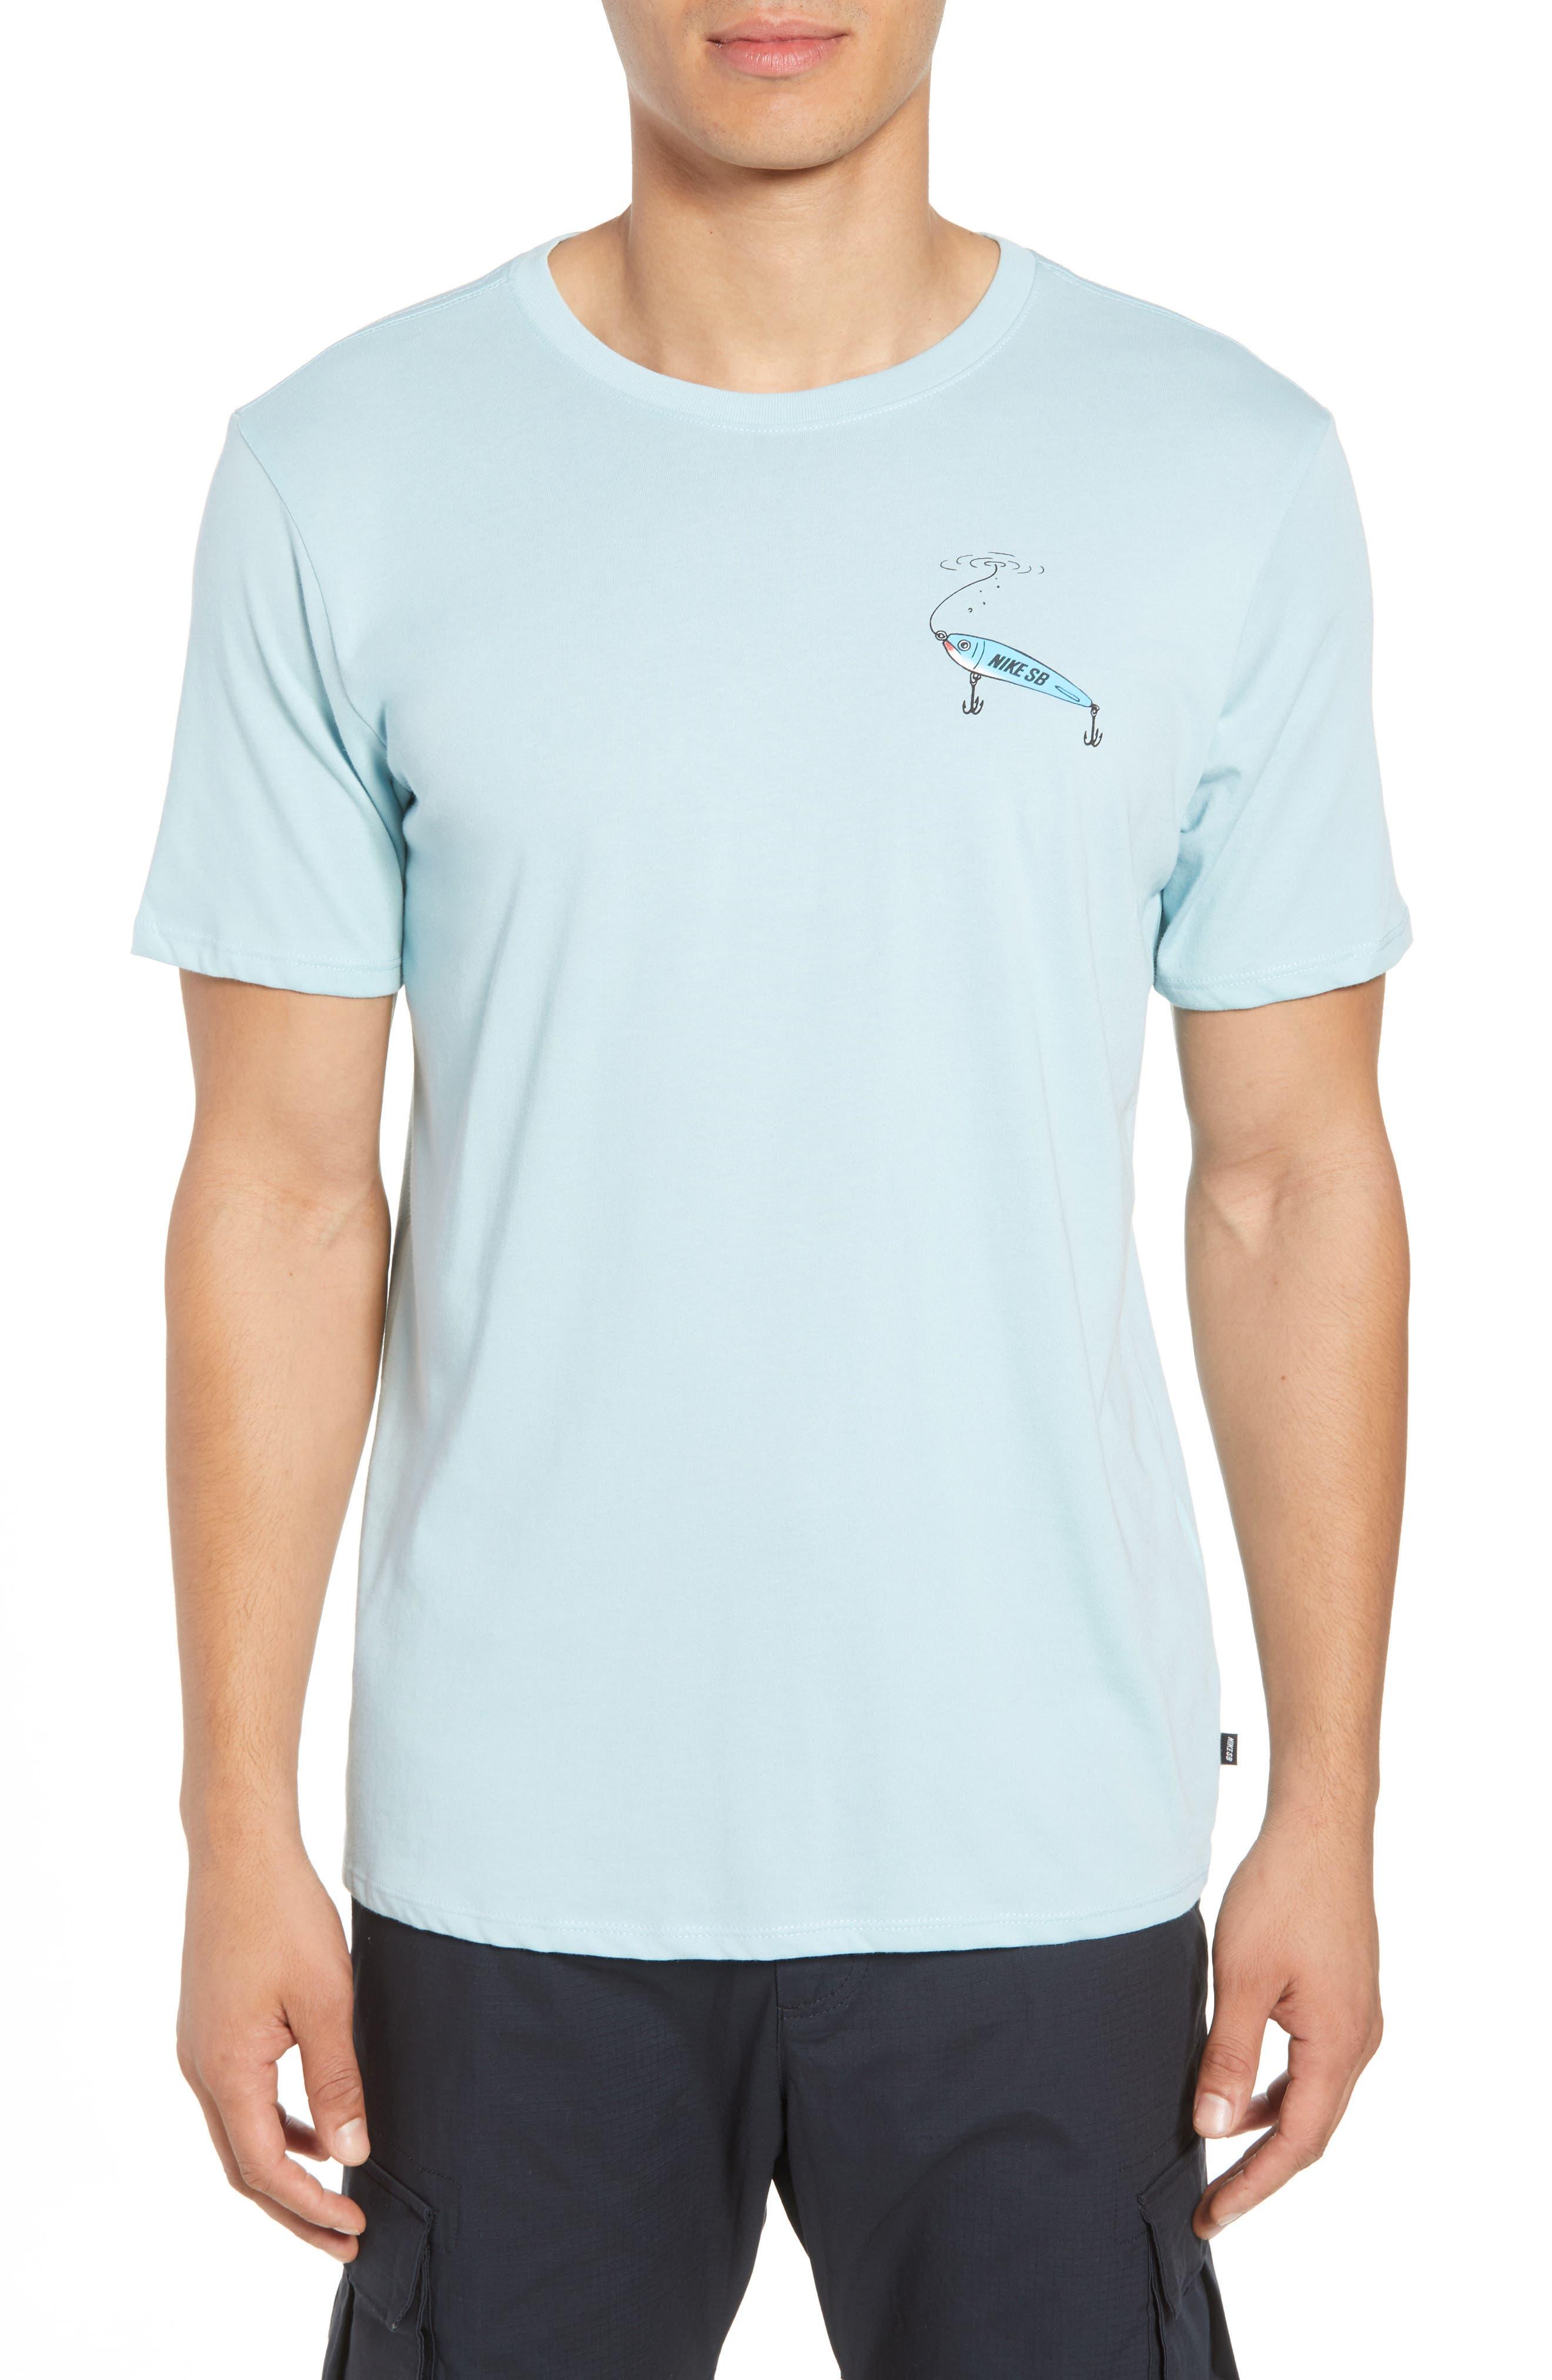 Dry Walrus T-Shirt,                             Main thumbnail 1, color,                             Ocean Bliss/ Black